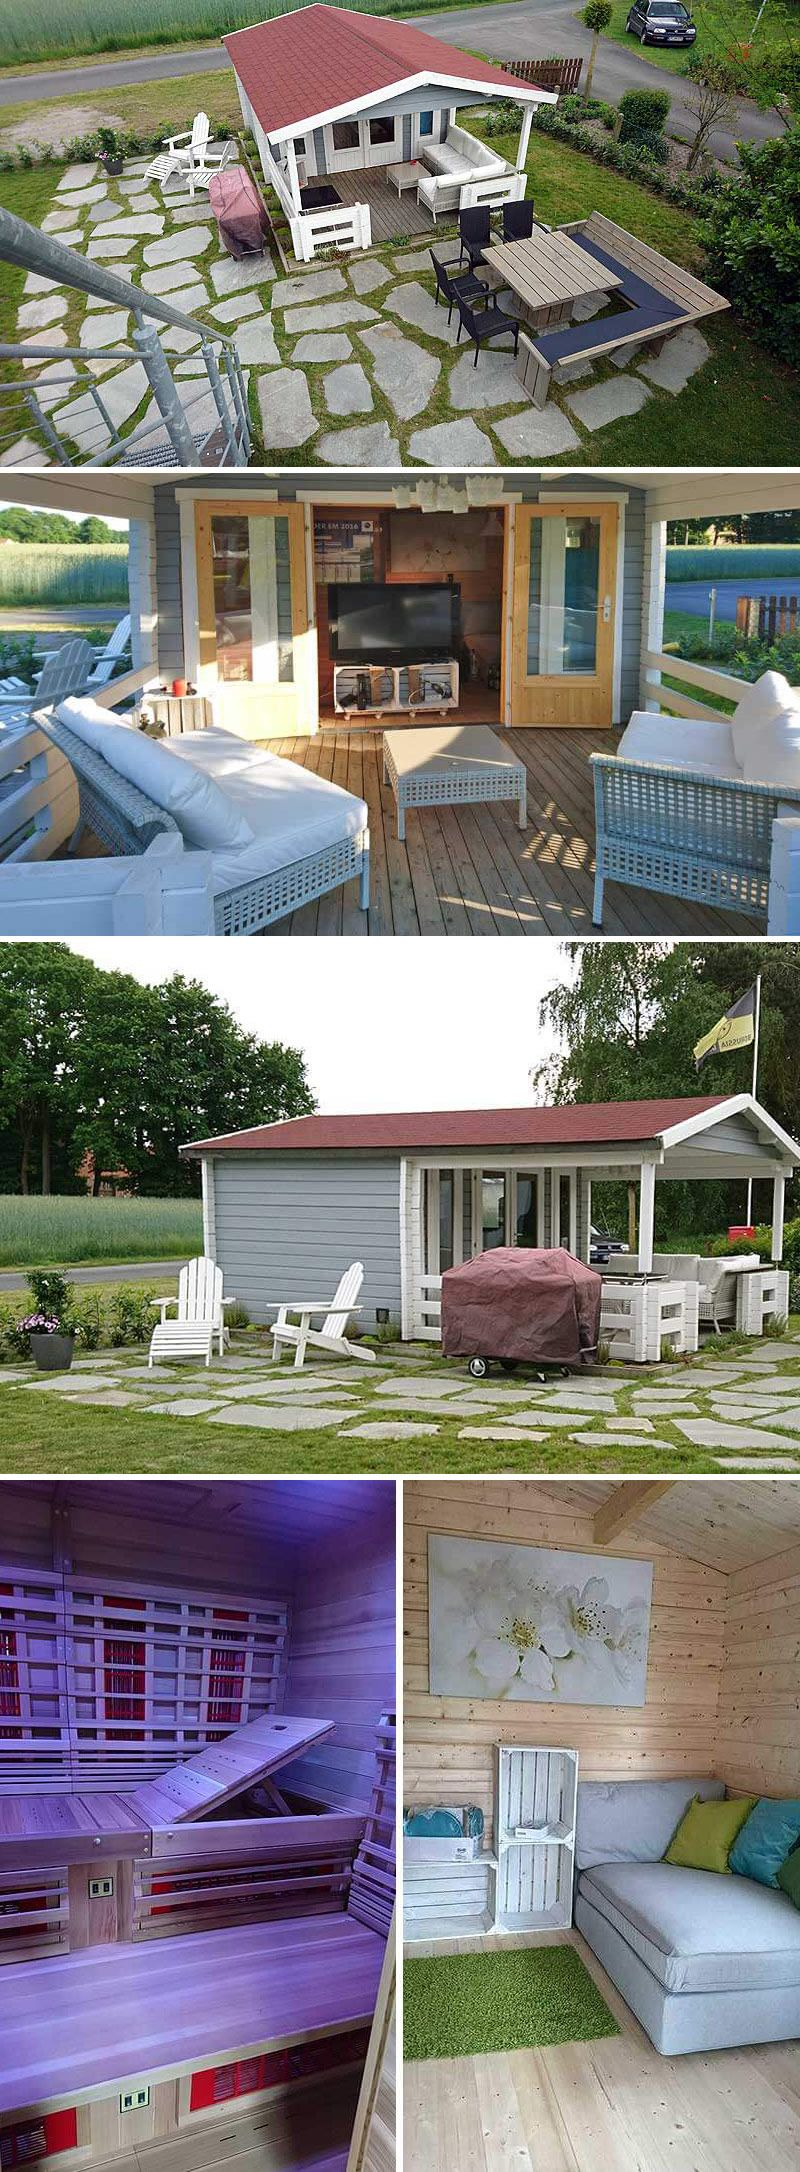 gartenhaus mit infrarotkabine sauna mal anders die besten kundenprojekte pinterest. Black Bedroom Furniture Sets. Home Design Ideas